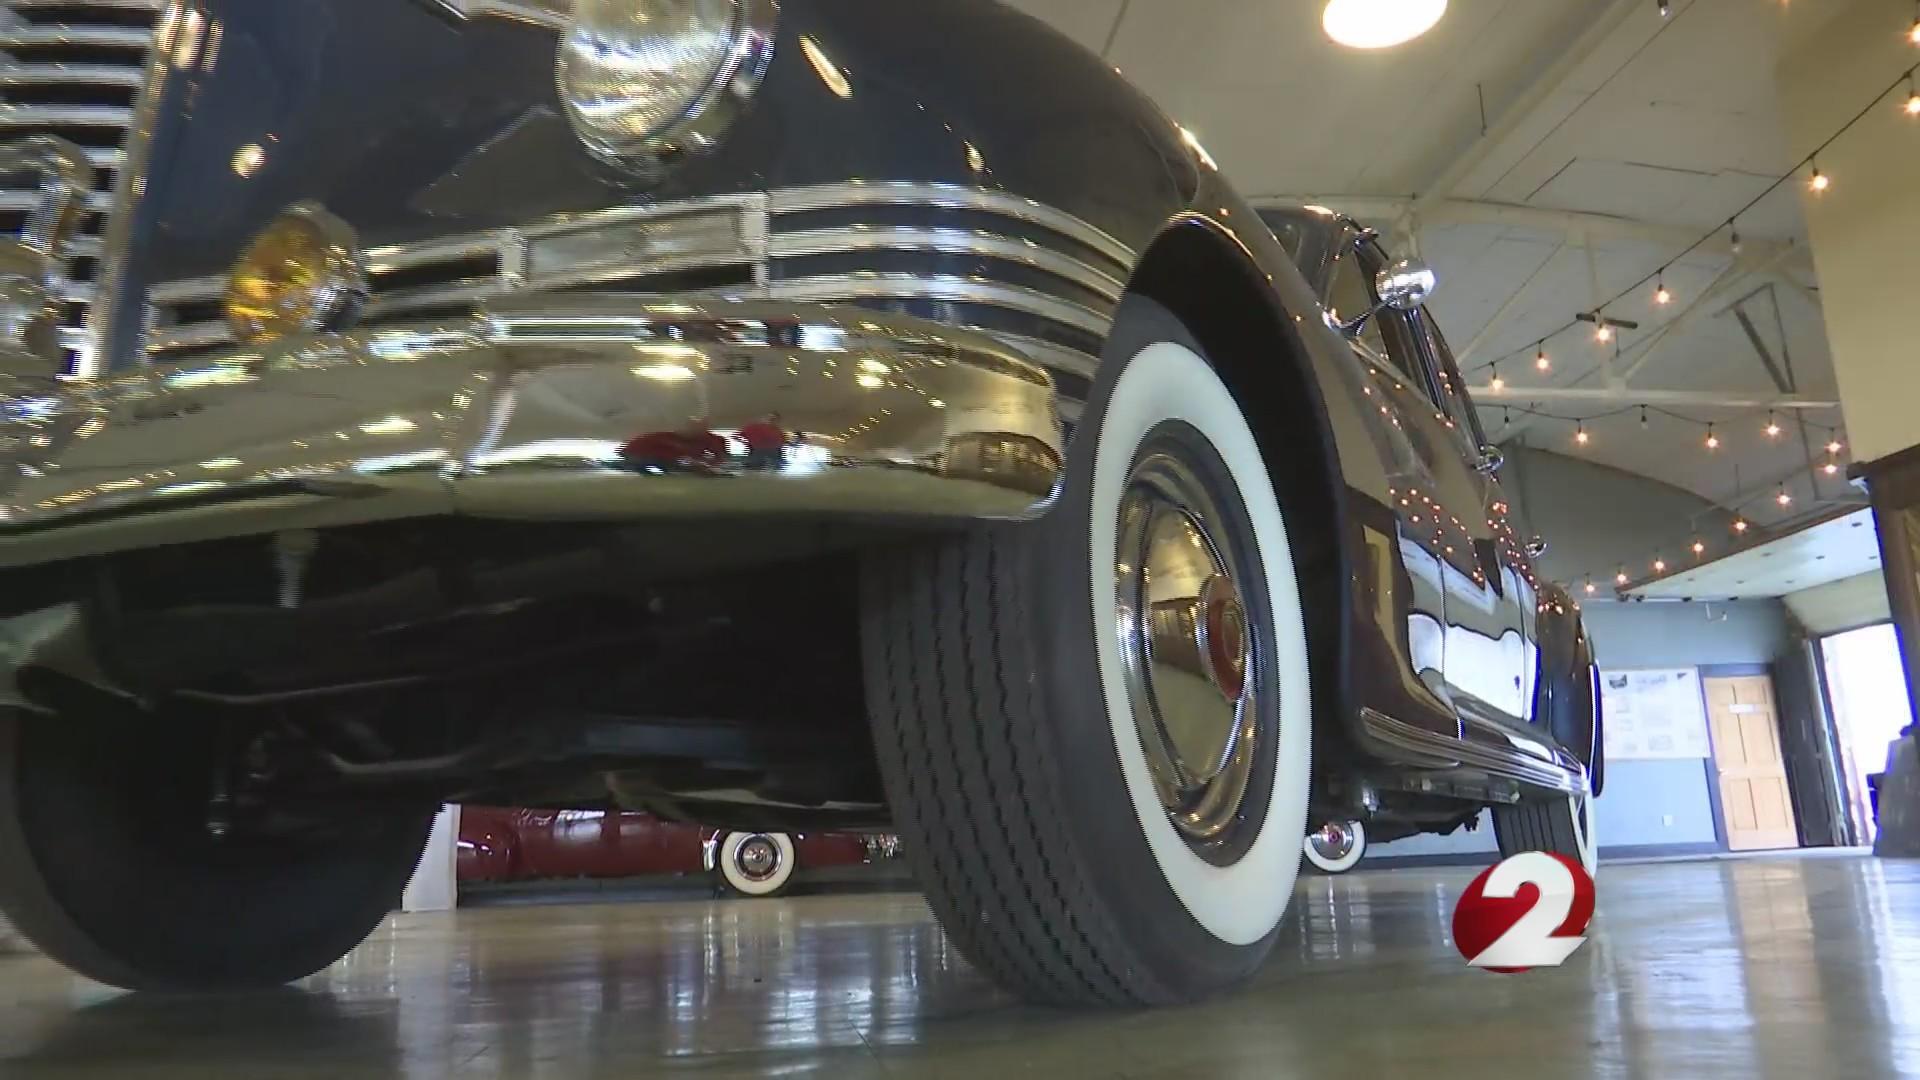 I Love Dayton: America's Packard Museum